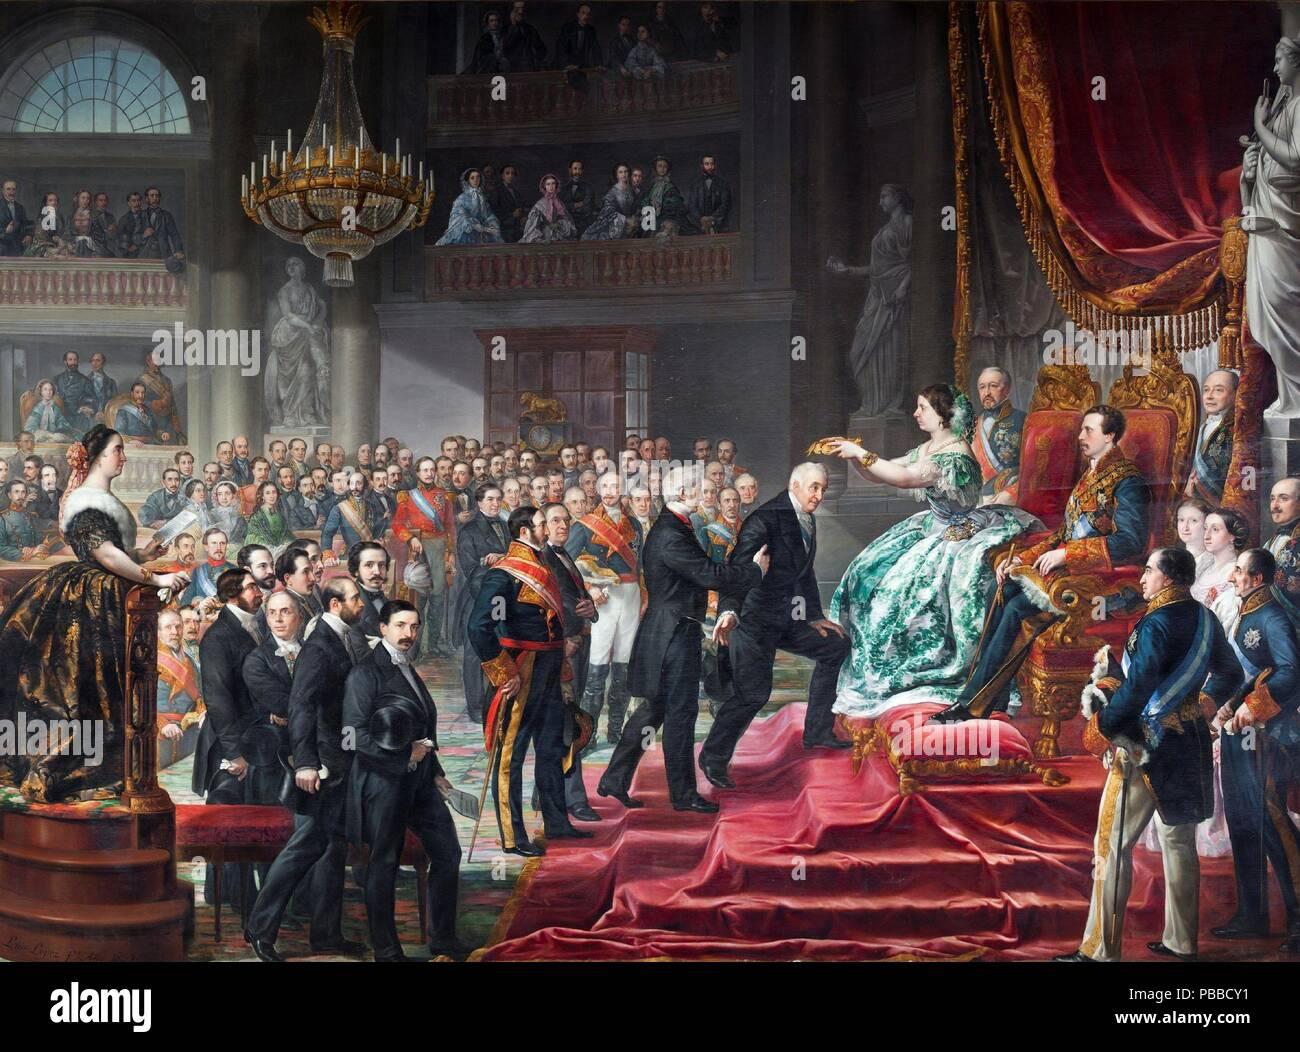 Luis López Piquer / 'The Coronation of the Quintana'. 1859. Oil on canvas. Museum: Museo del Prado, Madrid, España. - Stock Image